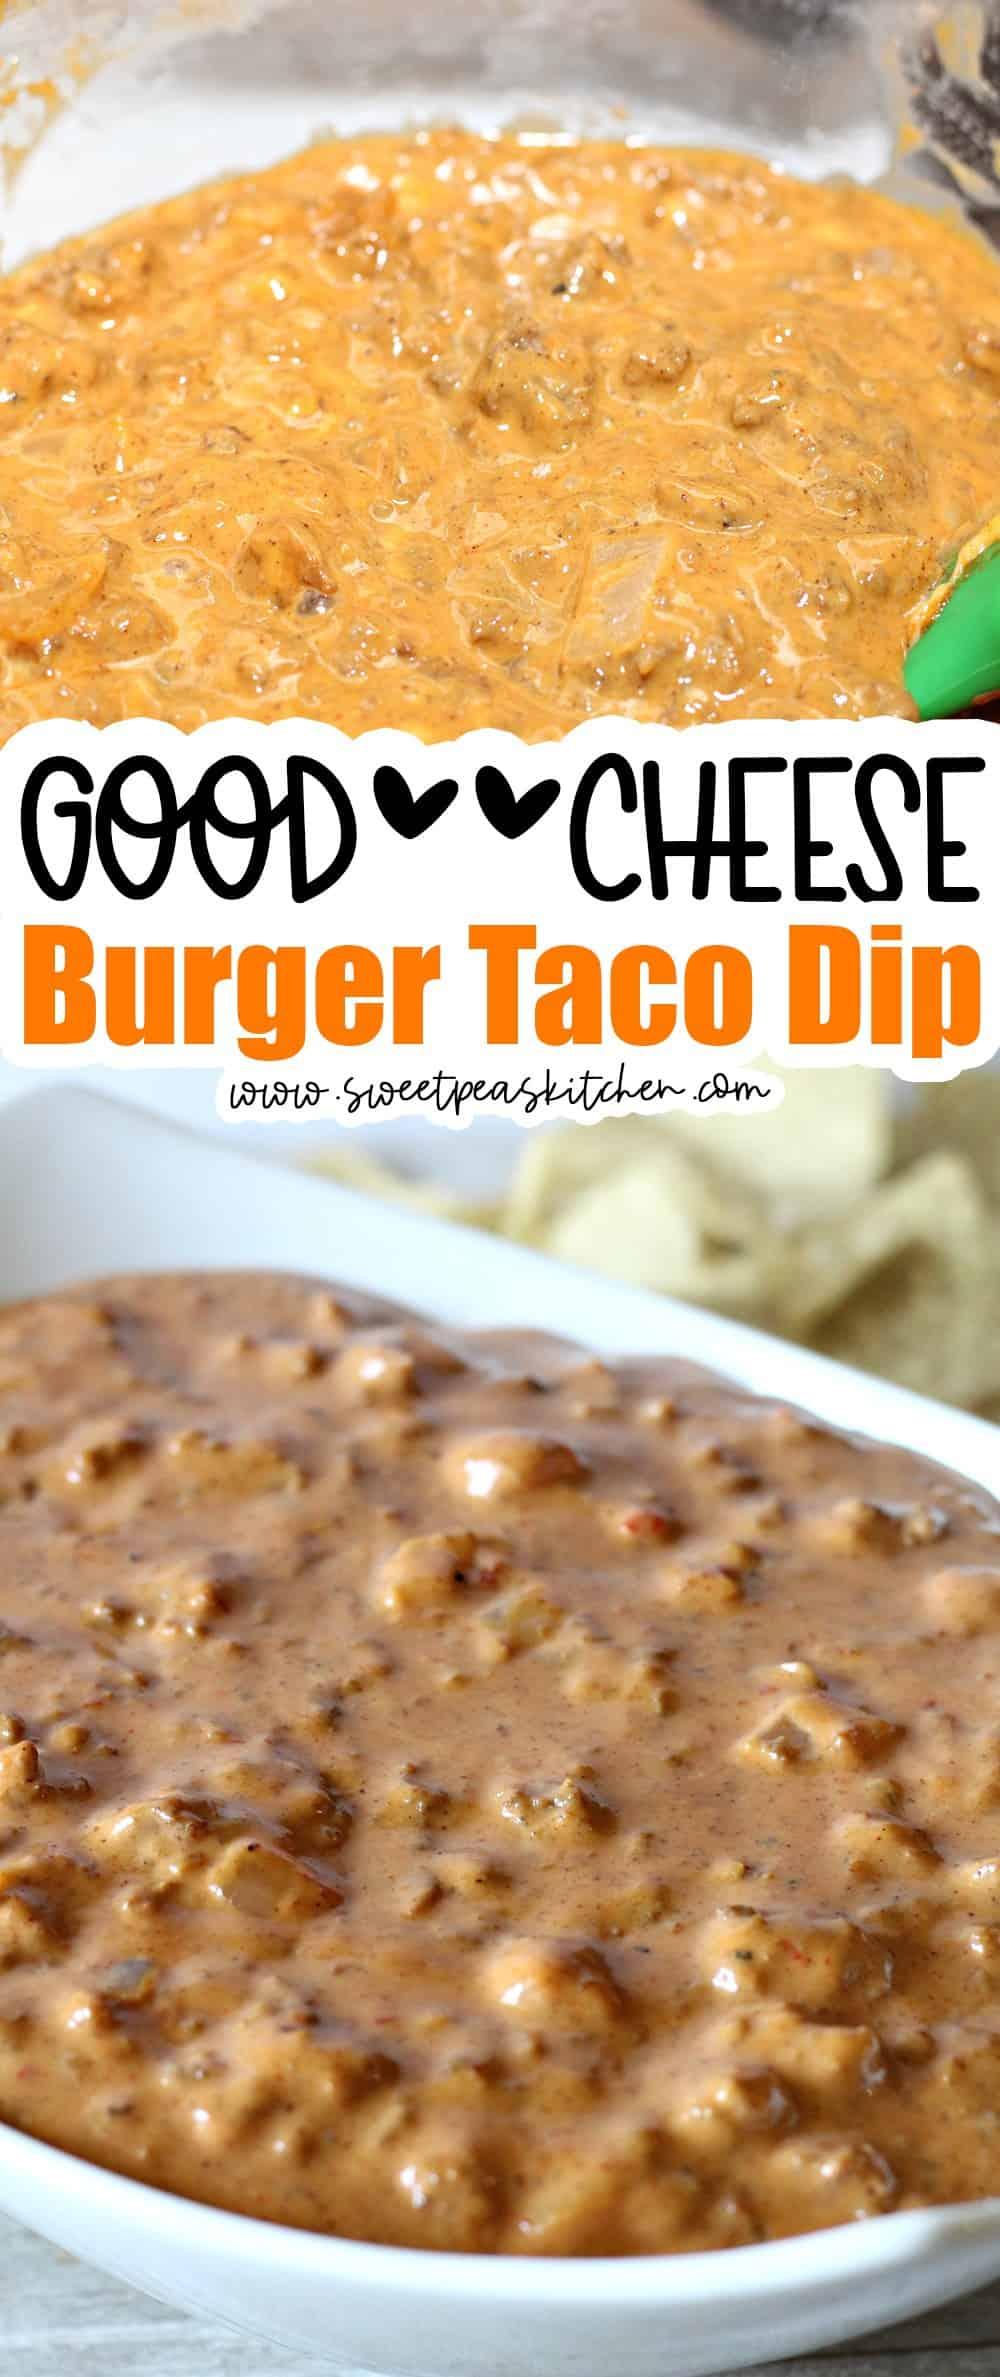 Cheese Burger Taco Dip